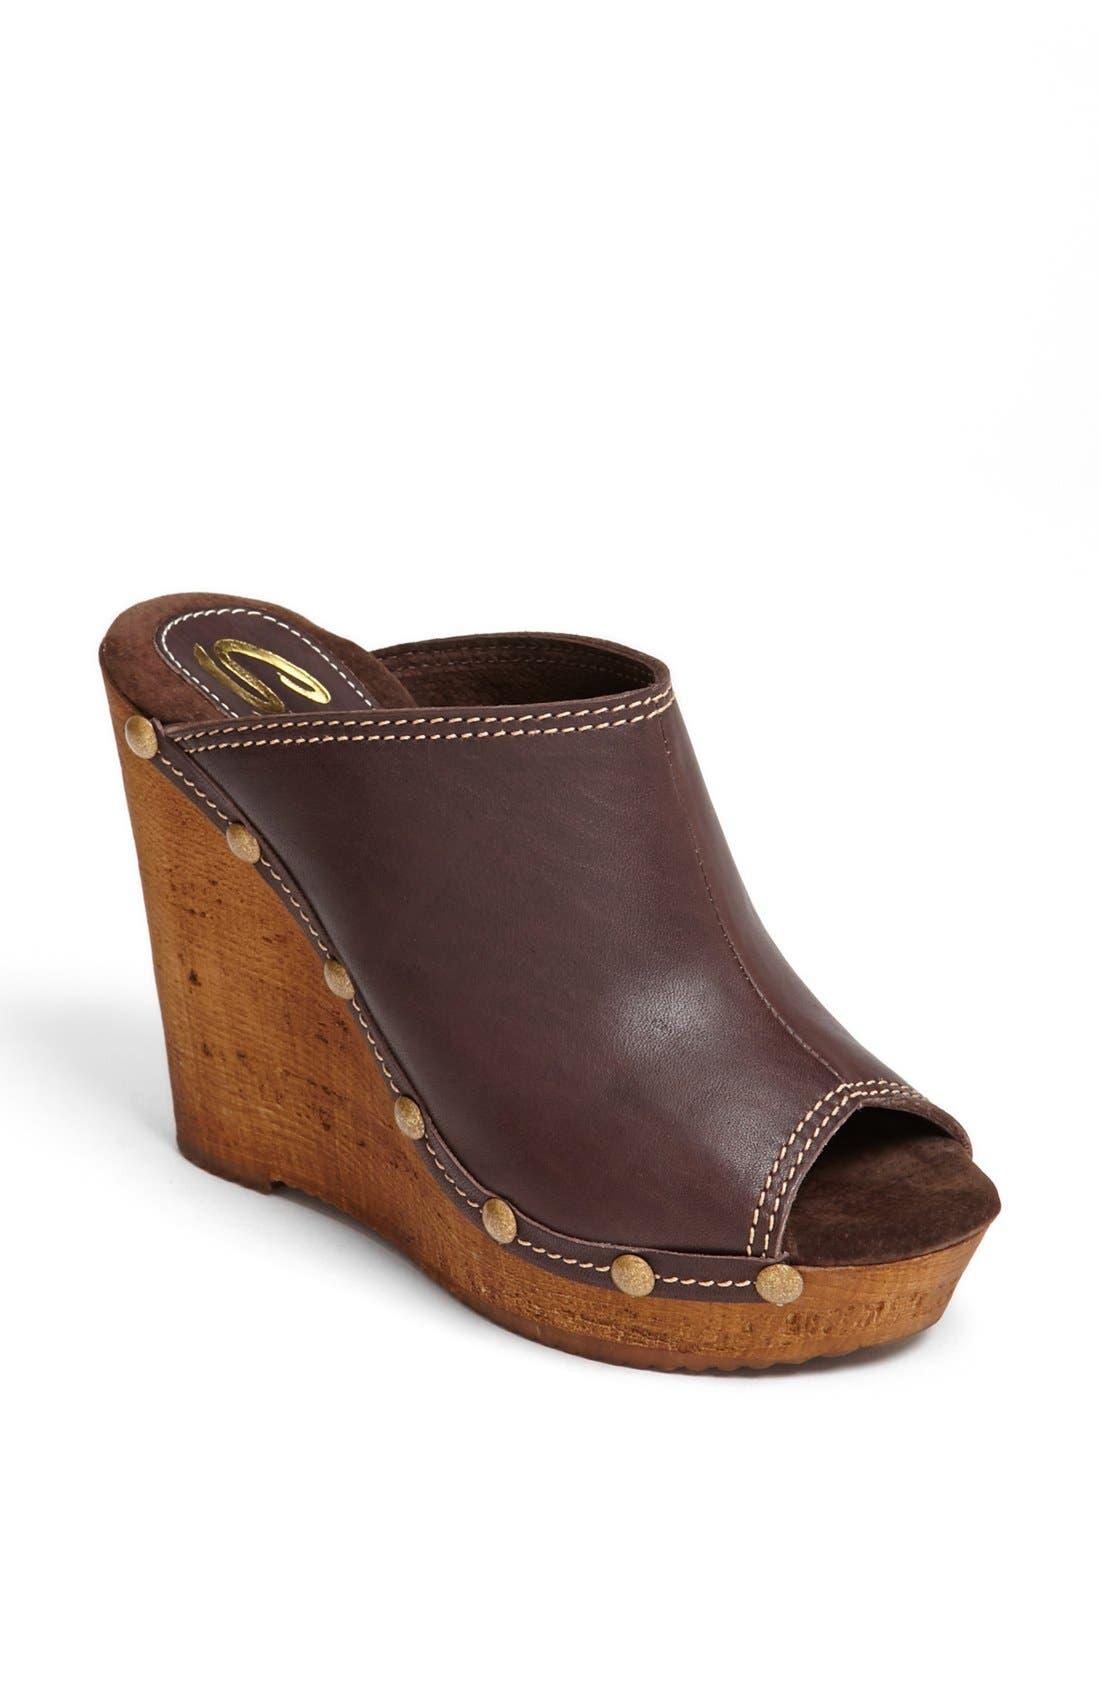 Alternate Image 1 Selected - Sbicca 'Guthrie' Wedge Sandal